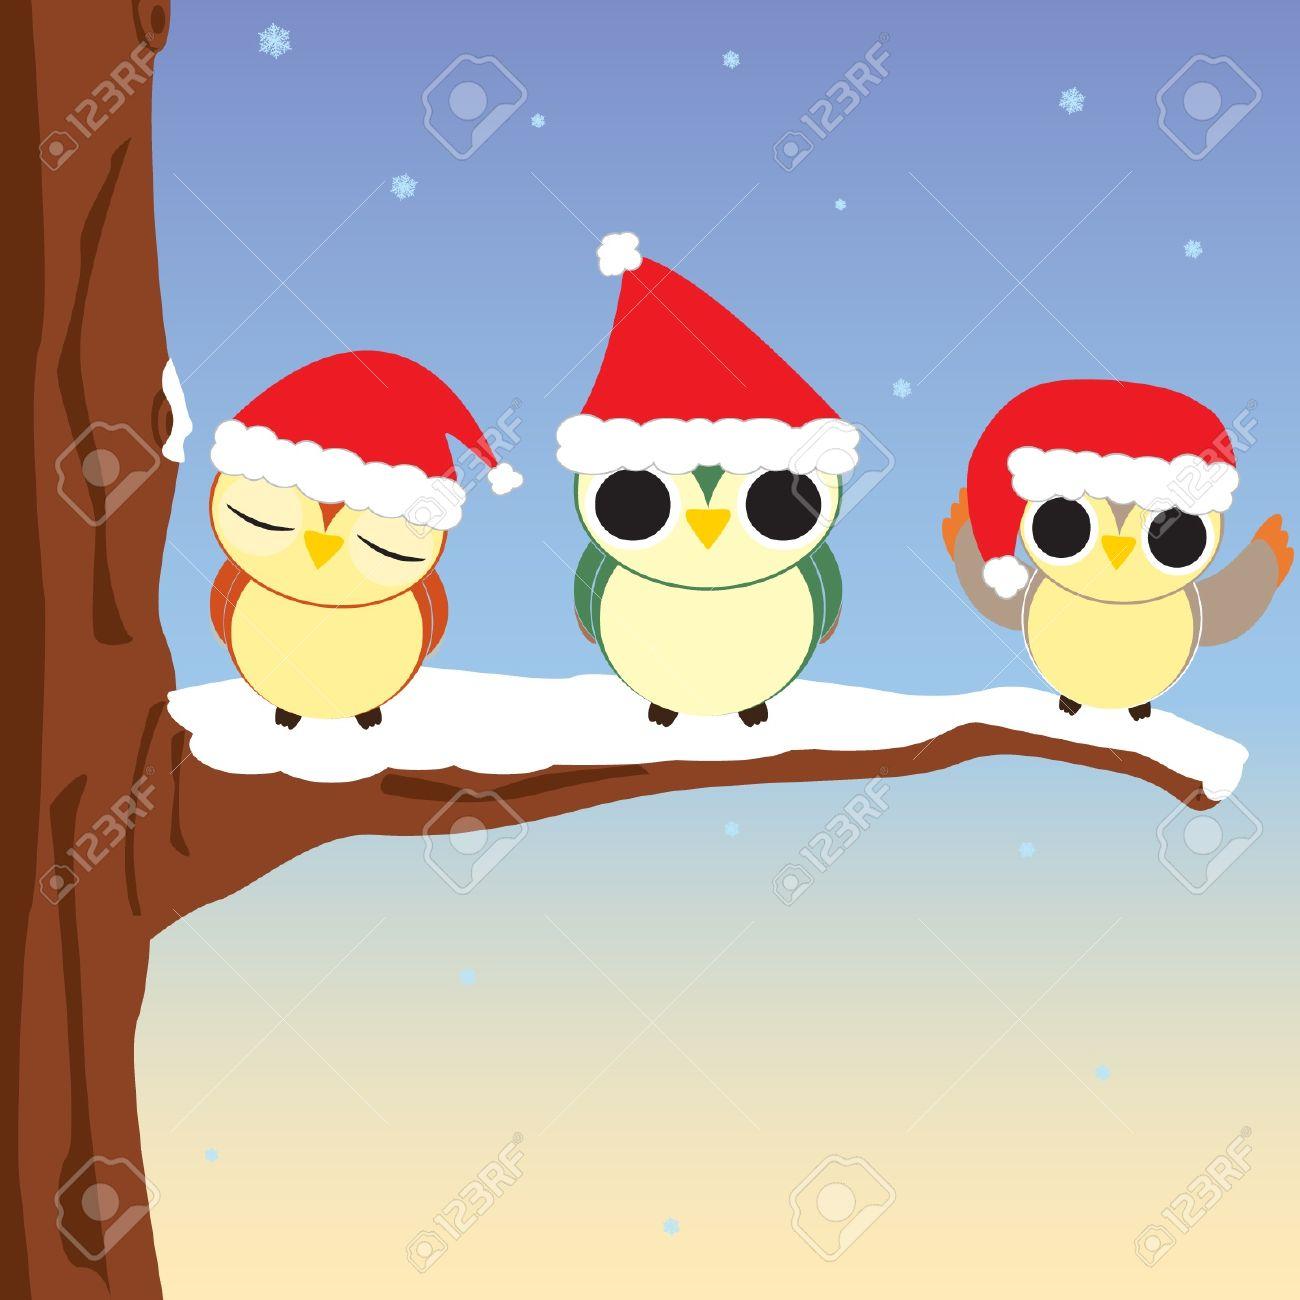 Vector illustration of three owls at Christmas Stock Vector - 16189525